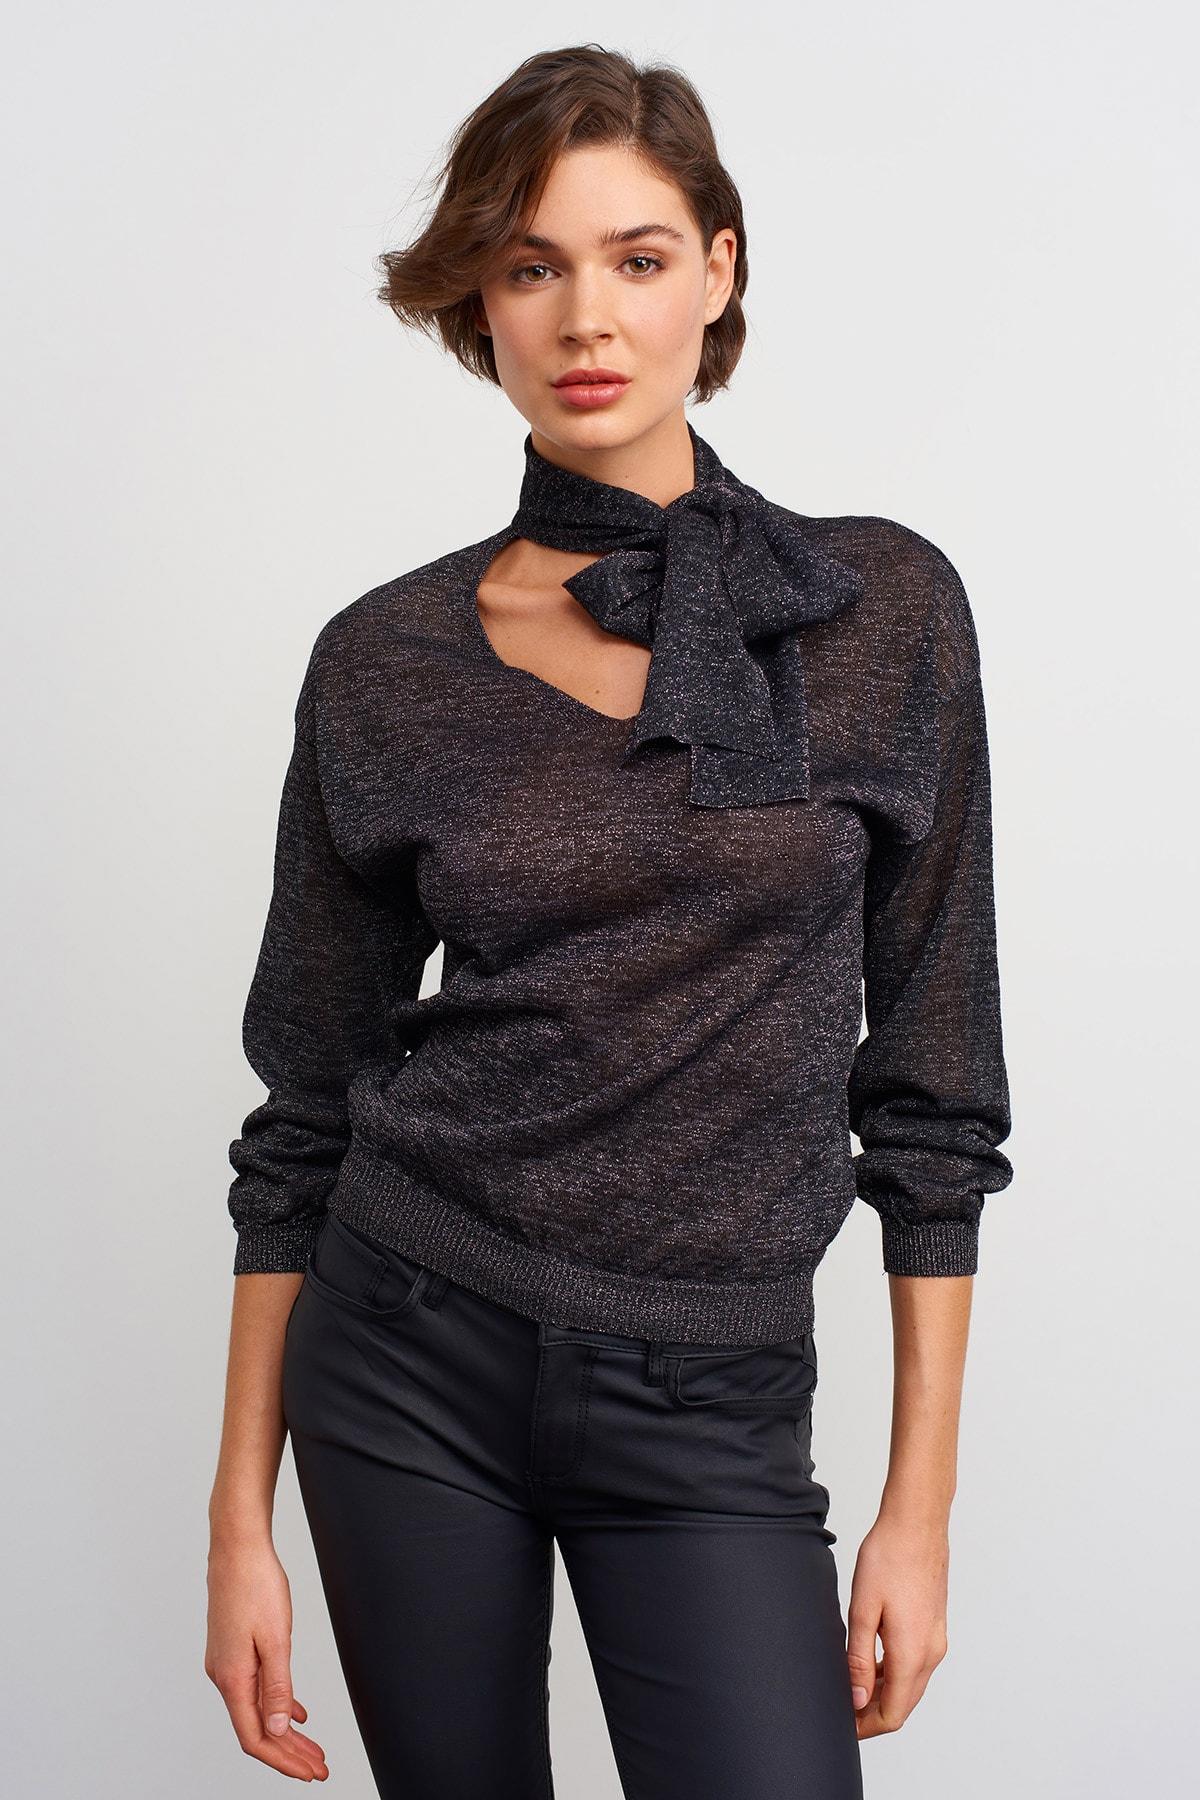 JOIN US Kadın Siyah Bağlama Yaka Simli Triko Bluz 1